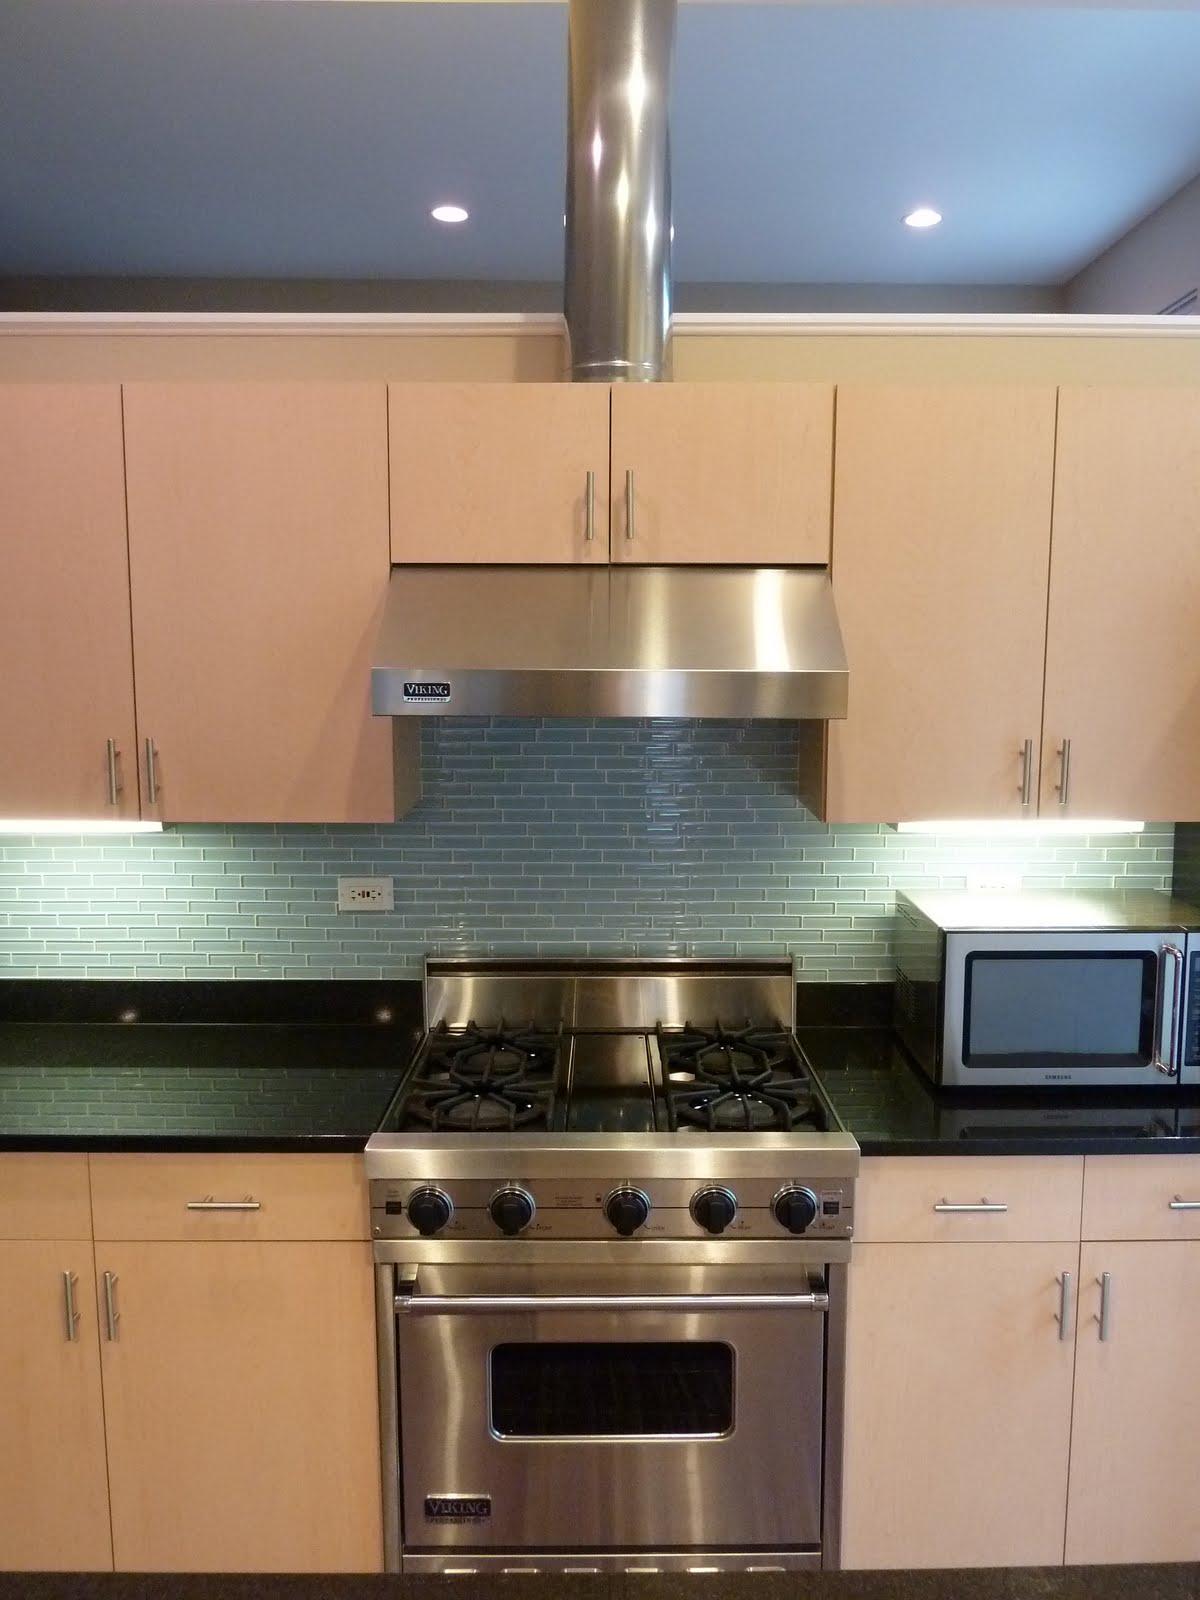 Kitchen Appliances Belmont Road Liverpool